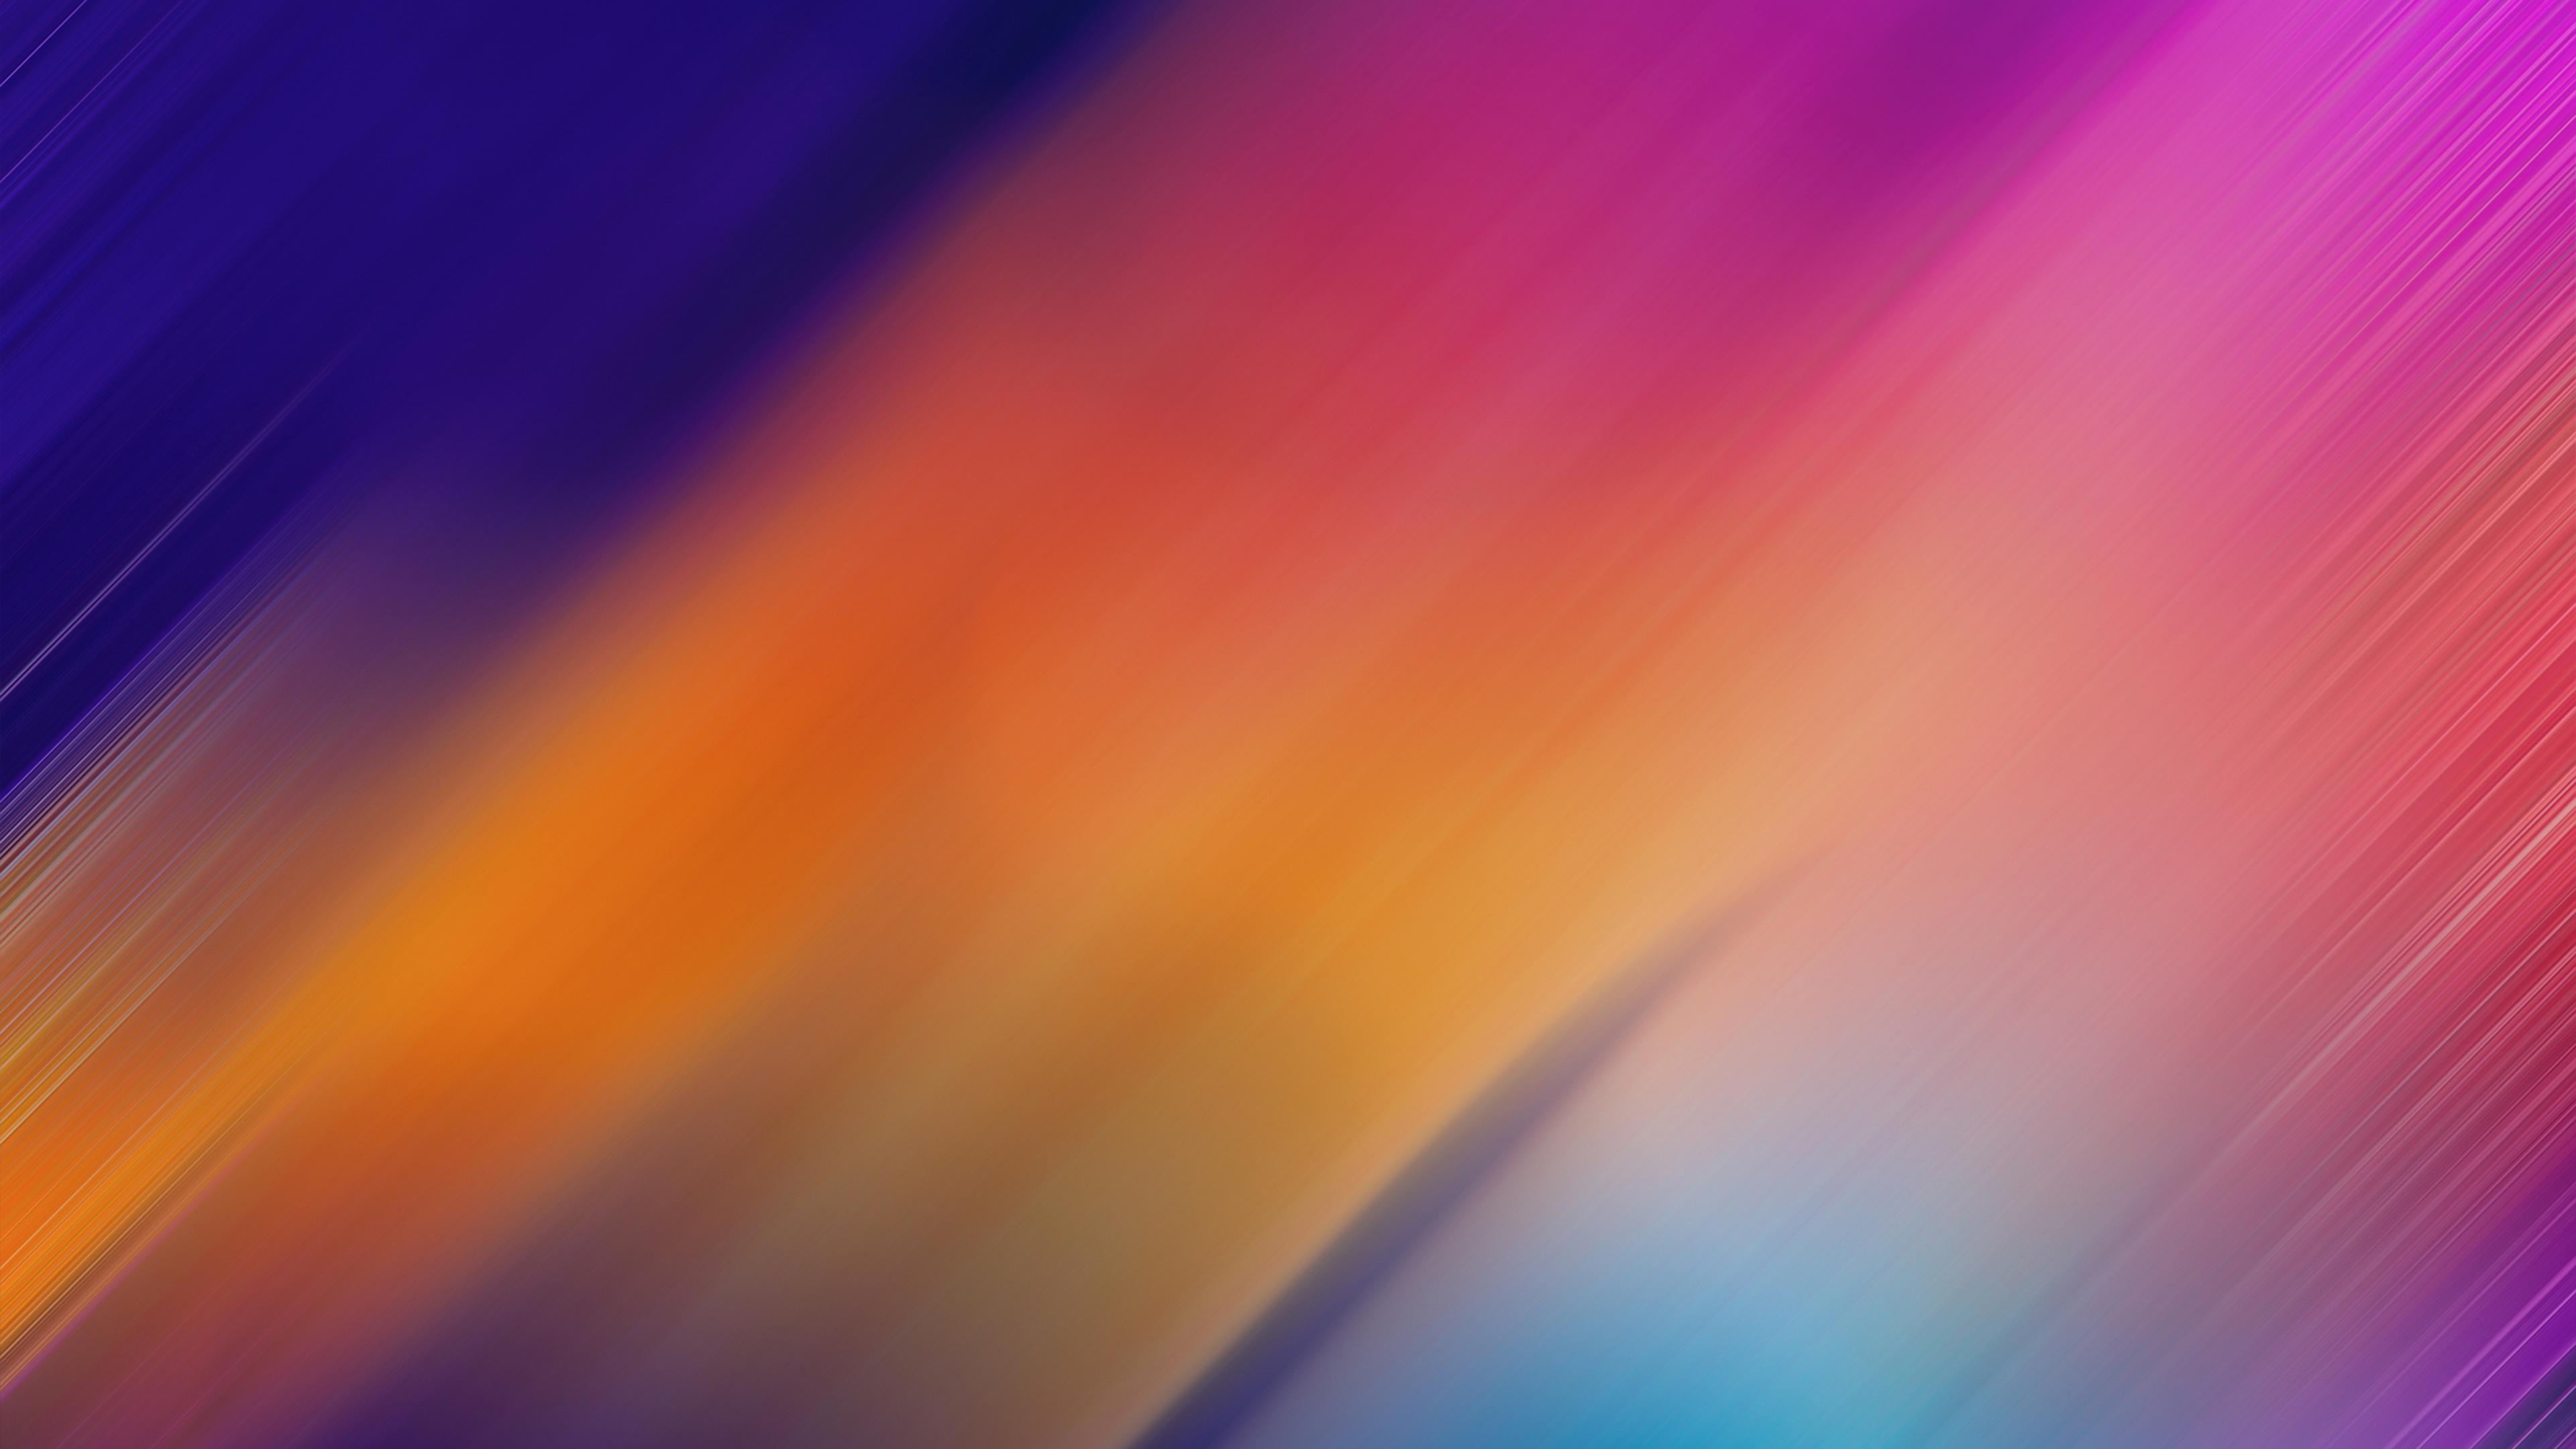 abstract gradient art 1570394904 - Abstract Gradient Art - hd-wallpapers, gradient wallpapers, digital art wallpapers, abstract wallpapers, 4k-wallpapers